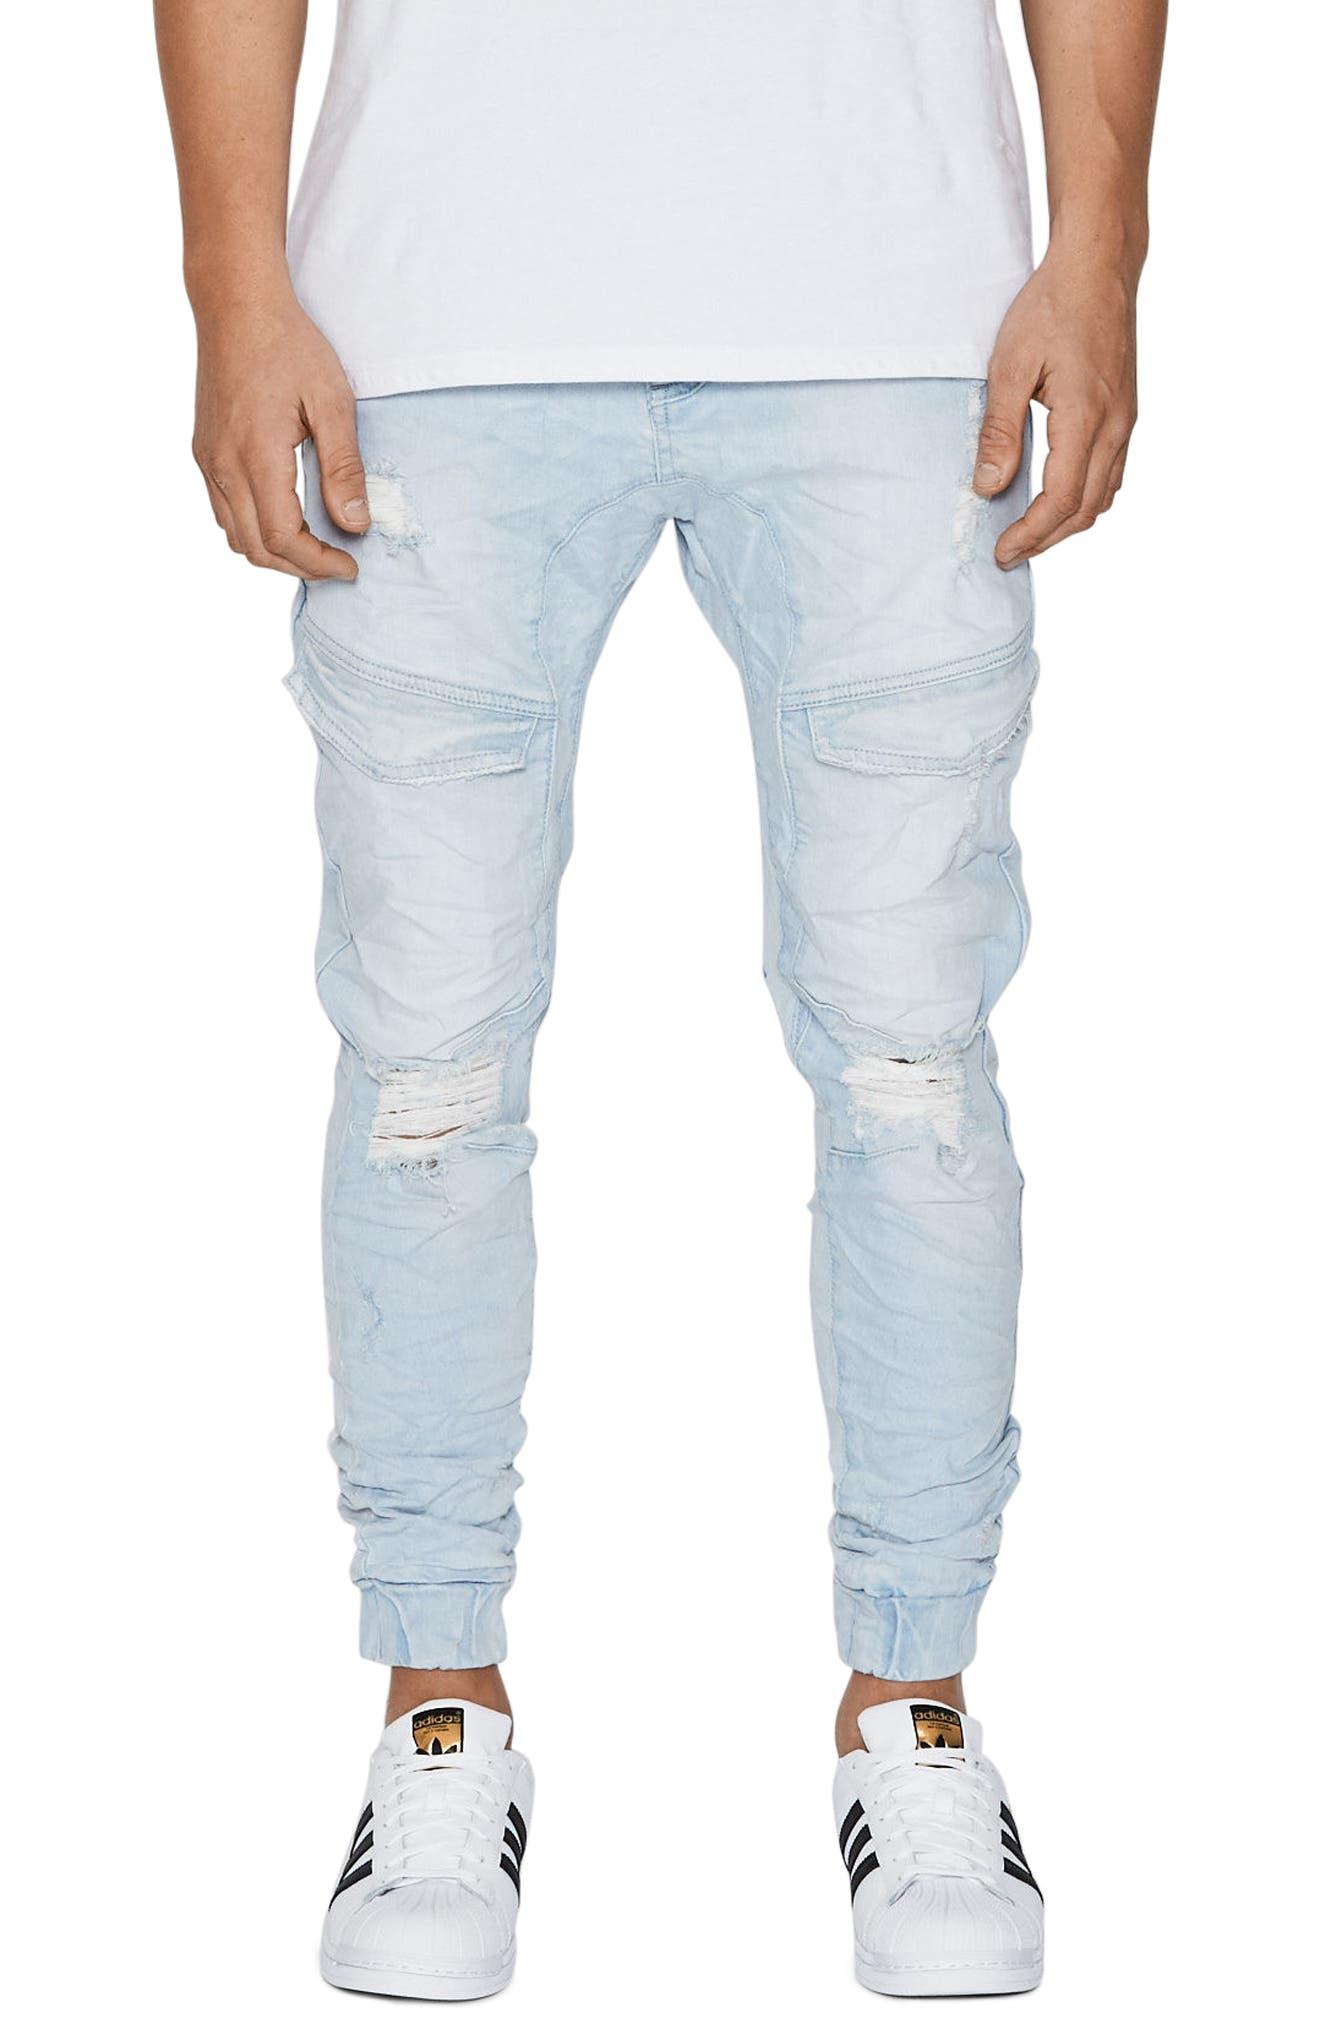 Flight Skinny Denim Jogger Pants,                         Main,                         color, Bleach White